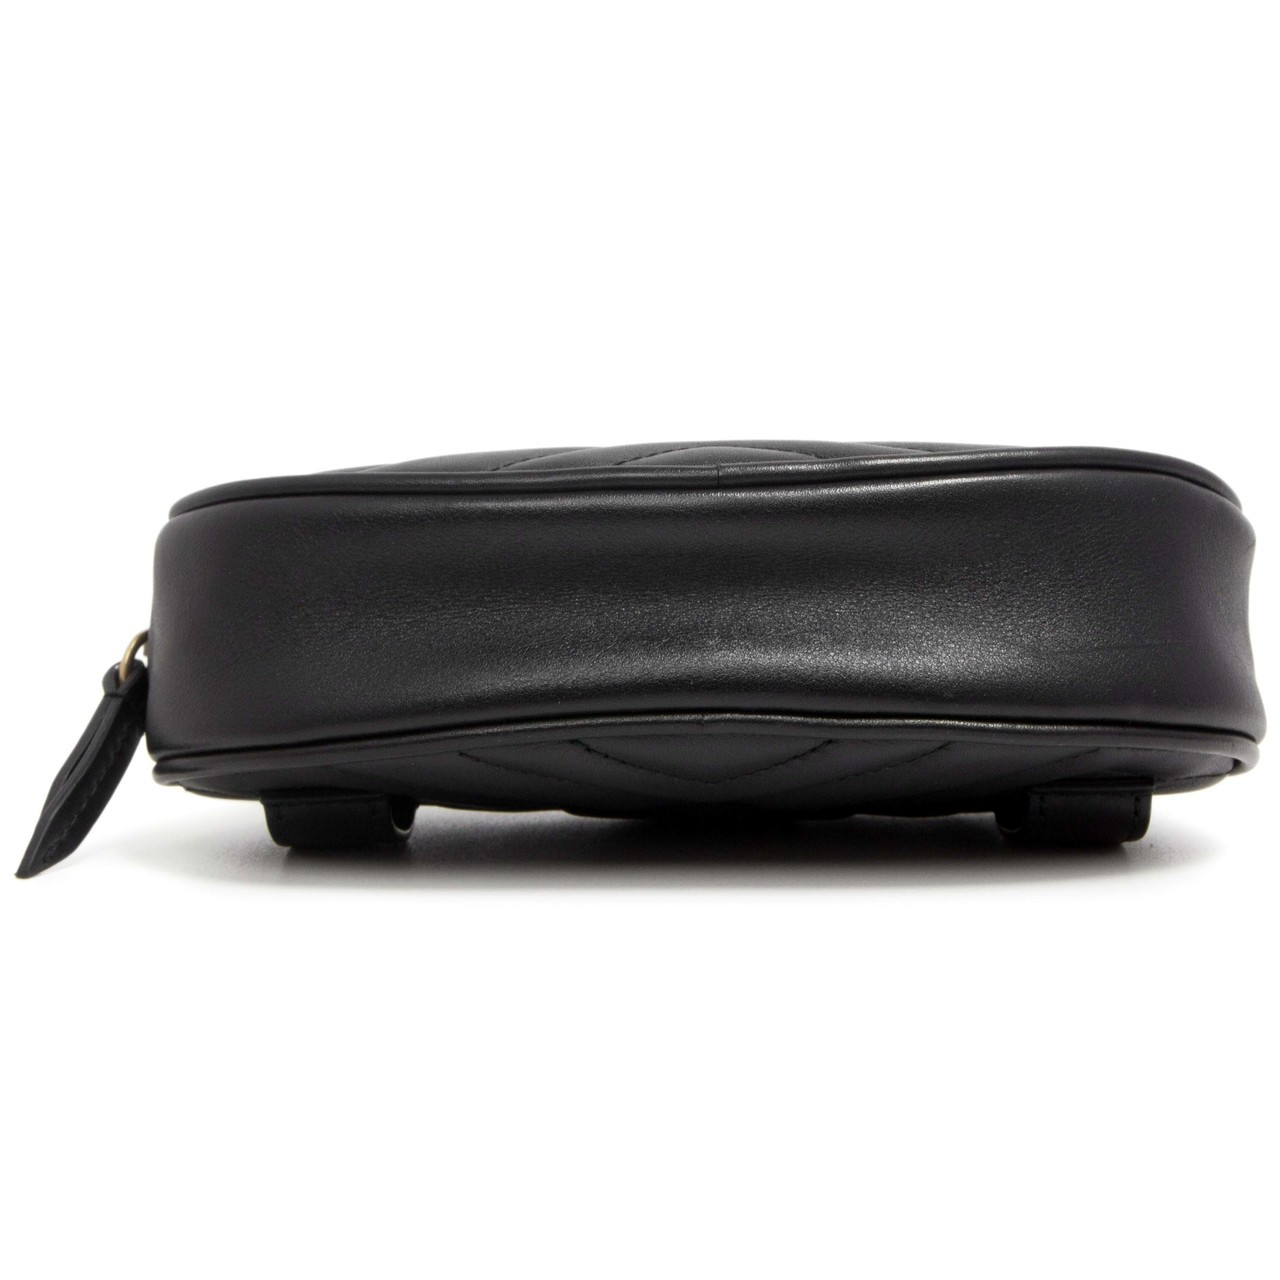 8cc554f80fec Gucci Black GG Marmont Matelasse Leather Belt Bag - modaselle